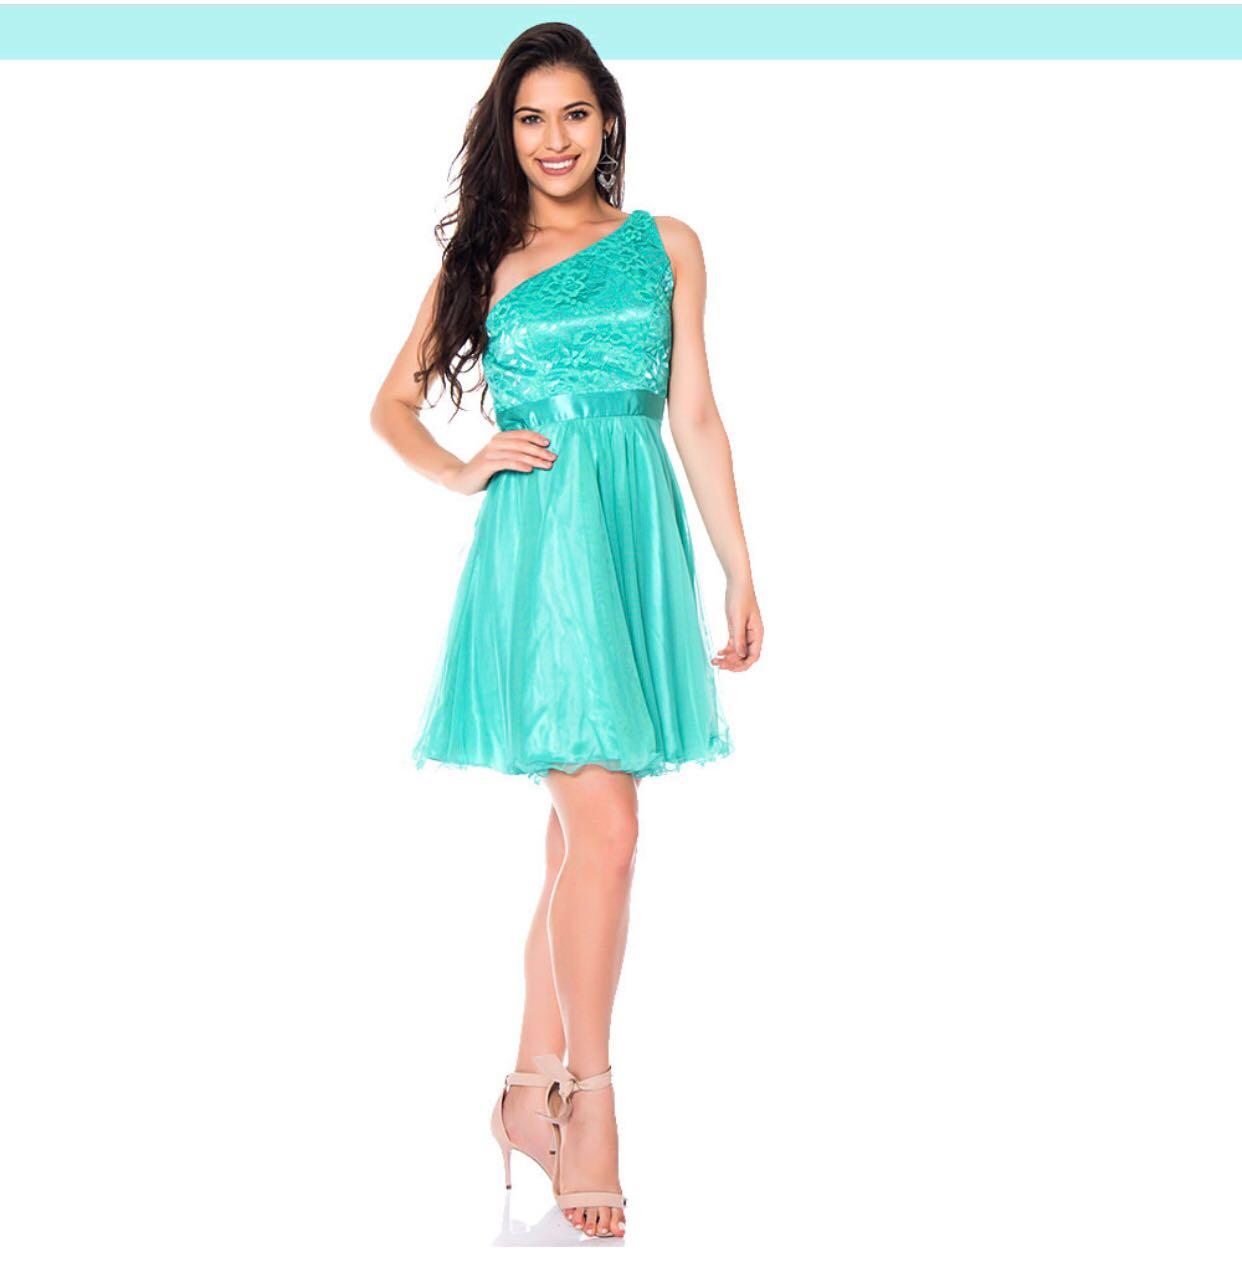 fc1c41238 Vestido curto princesa ombro só - Mon Cherri Moda Feminina